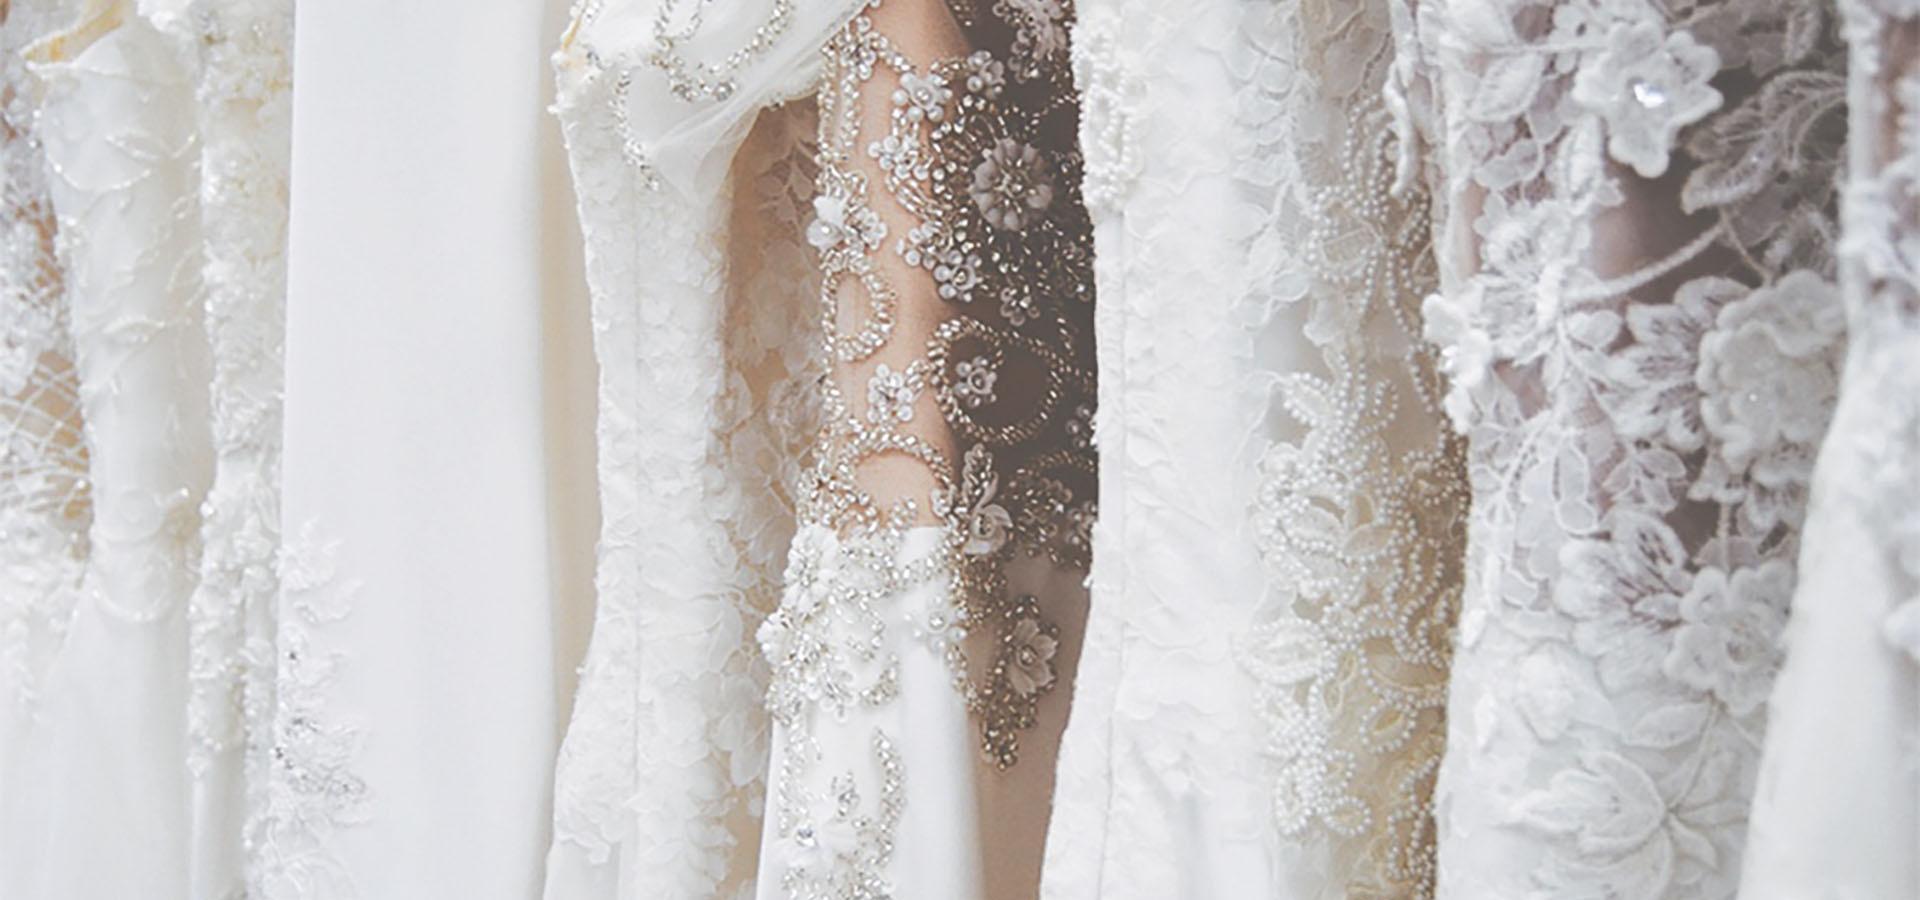 Atelier Vestiti Da Sposa.Atelier Dea Spose Dea Spose Atelier Abiti Da Sposa